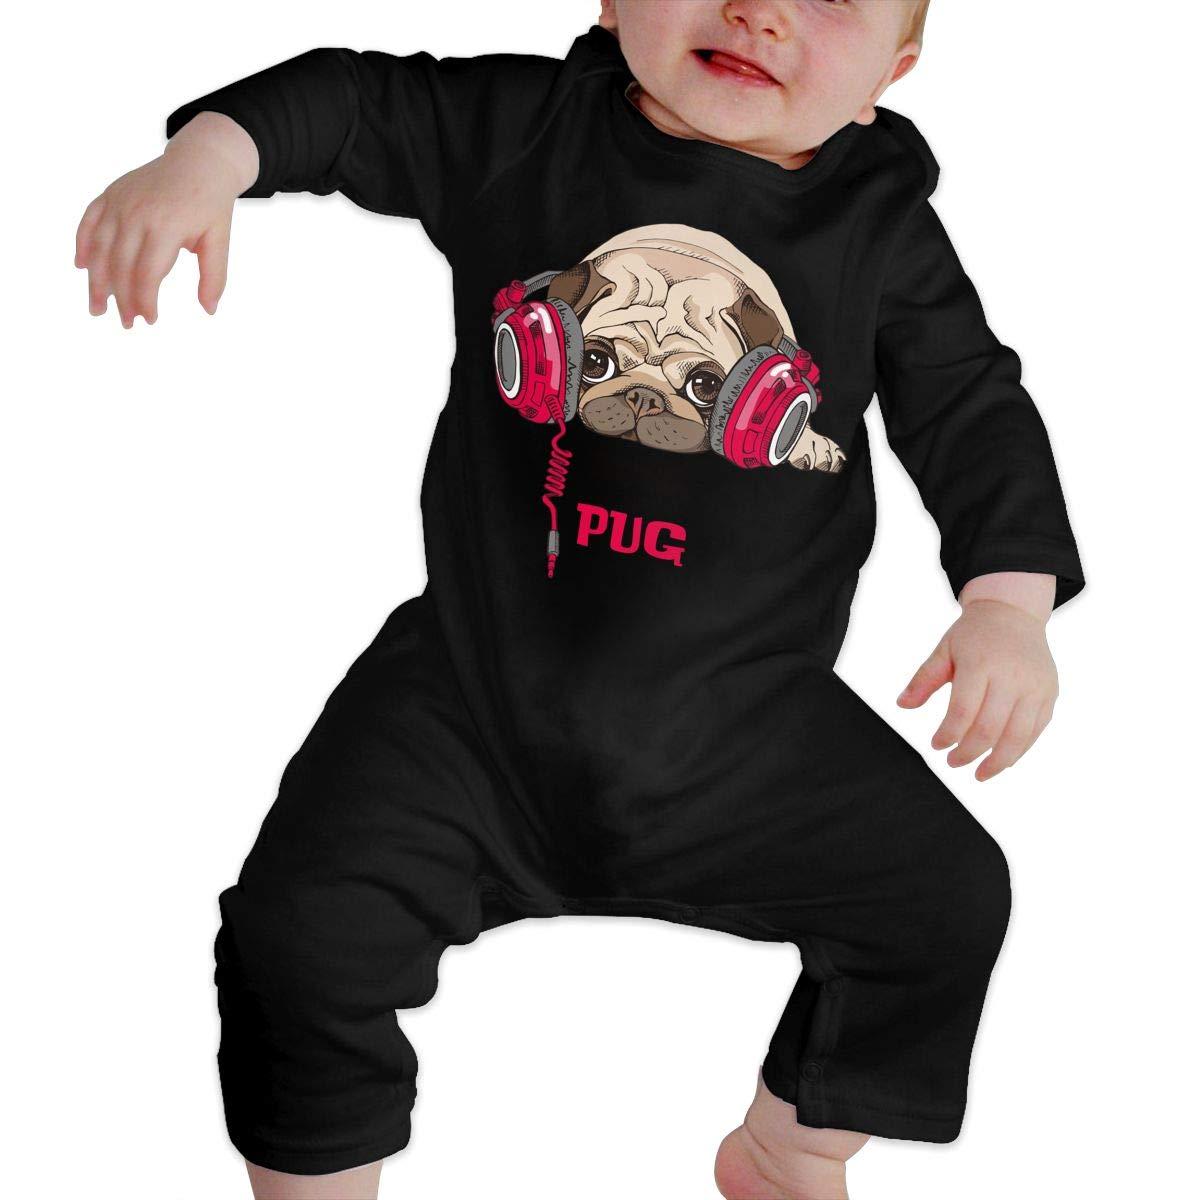 AucCen Babys Pug Jumpsuit Bodysuit Clothes Long Sleeve One-Piece Coverall 100/% Organic Cotton